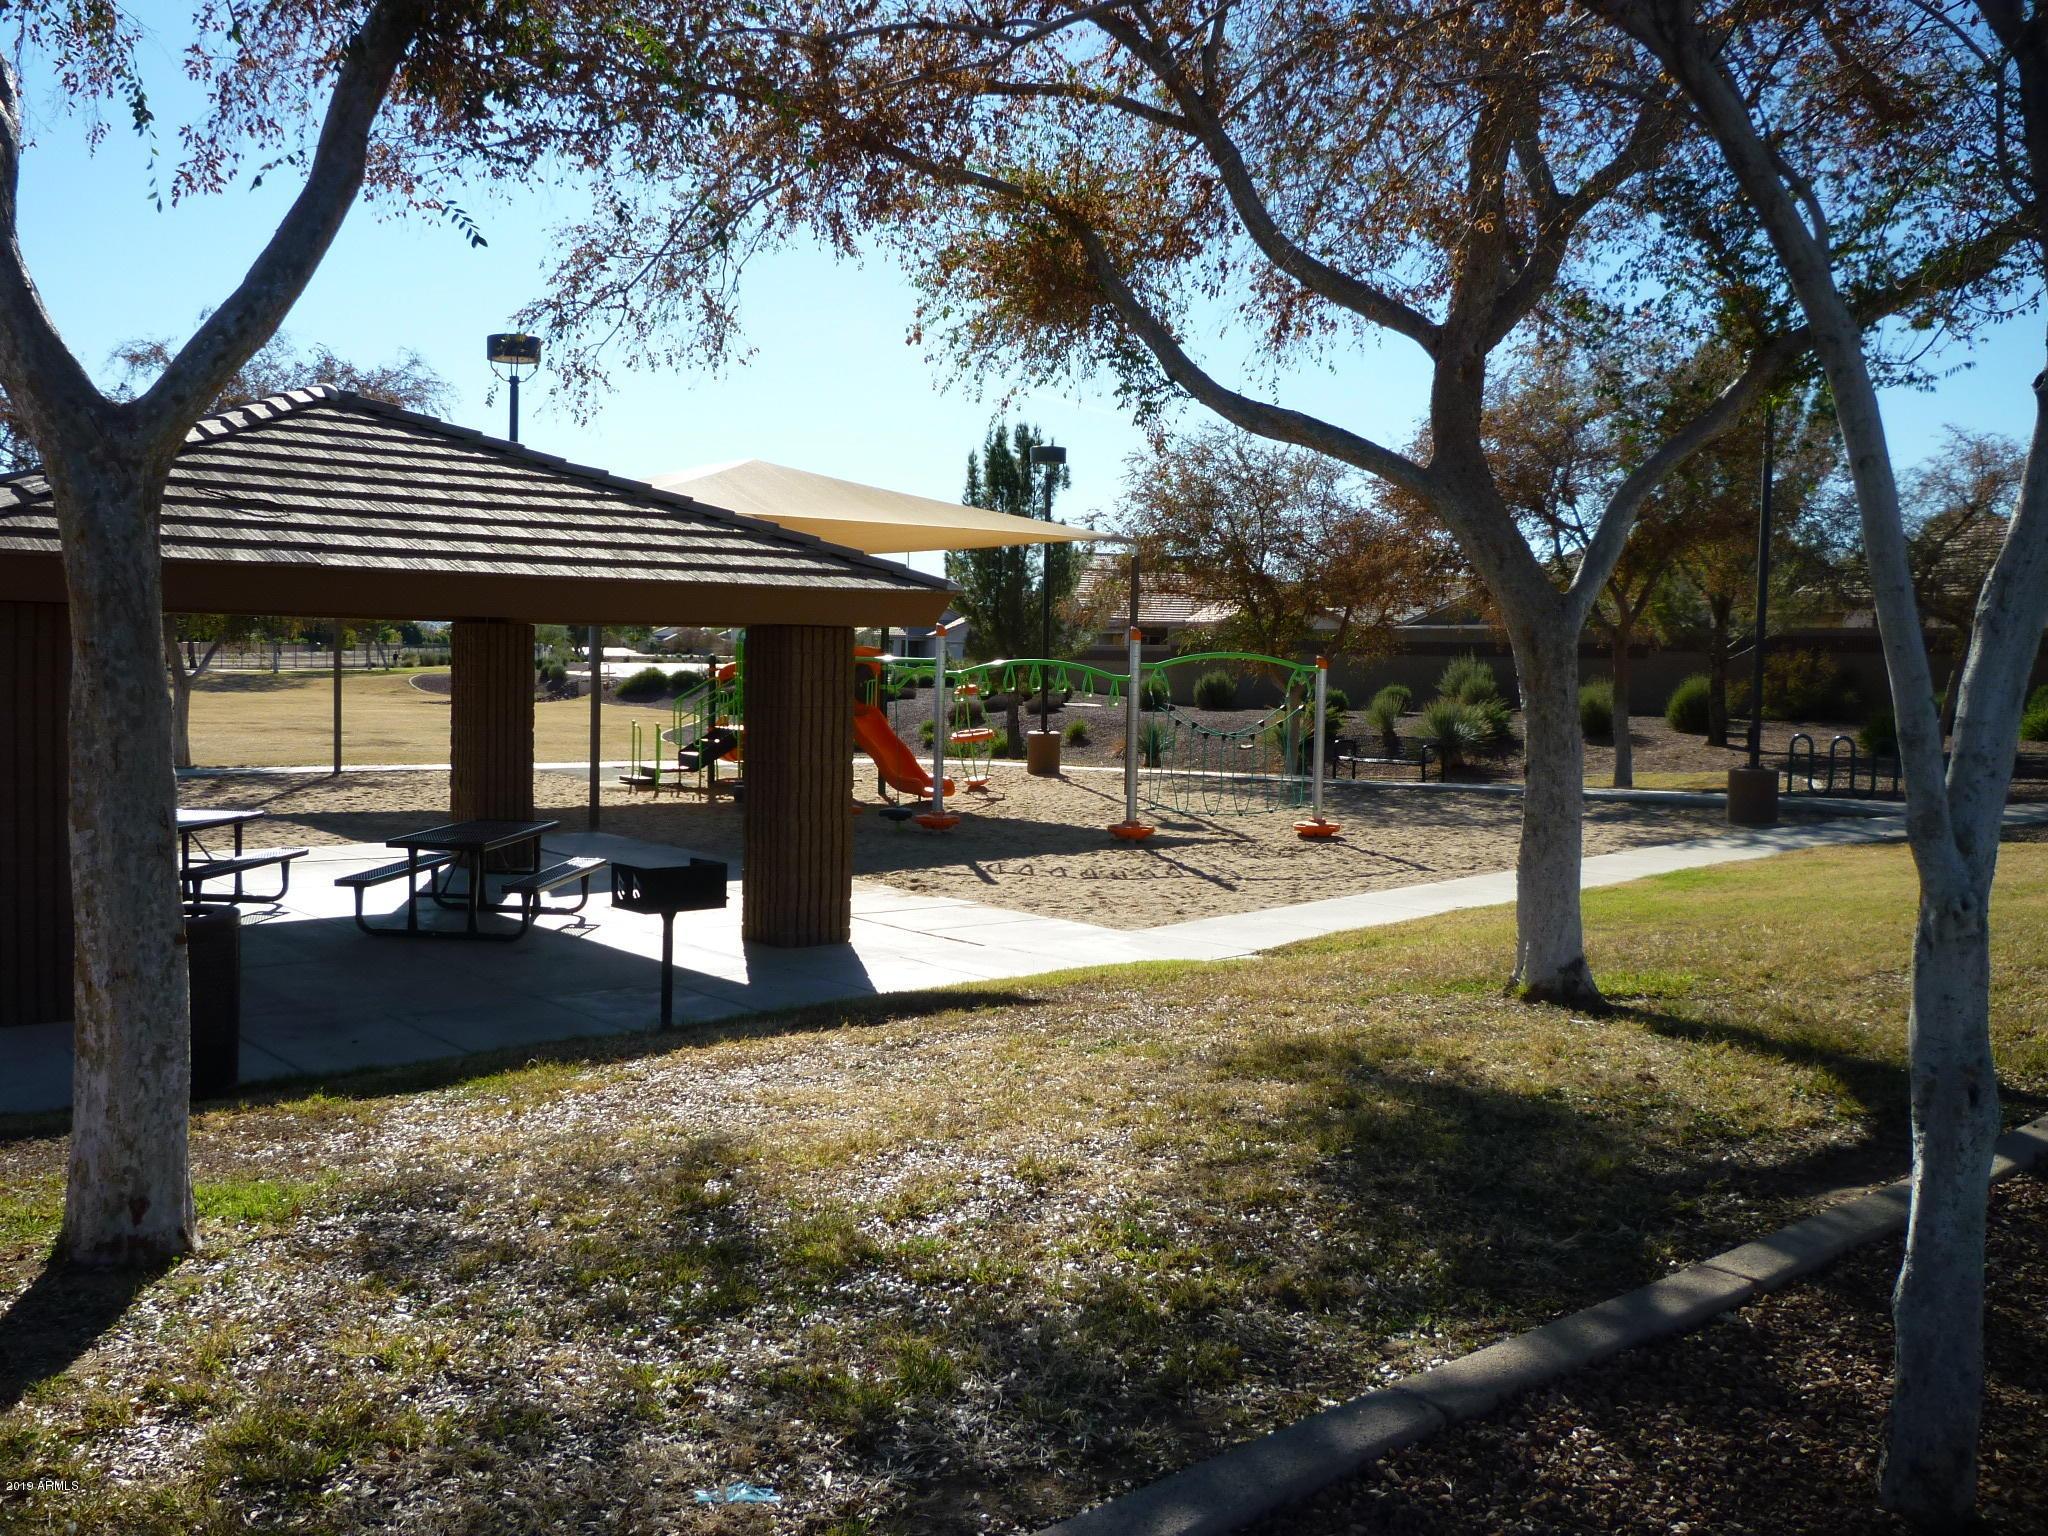 MLS 5872388 12556 W CLARENDON Avenue, Avondale, AZ 85392 Avondale AZ Corte Sierra